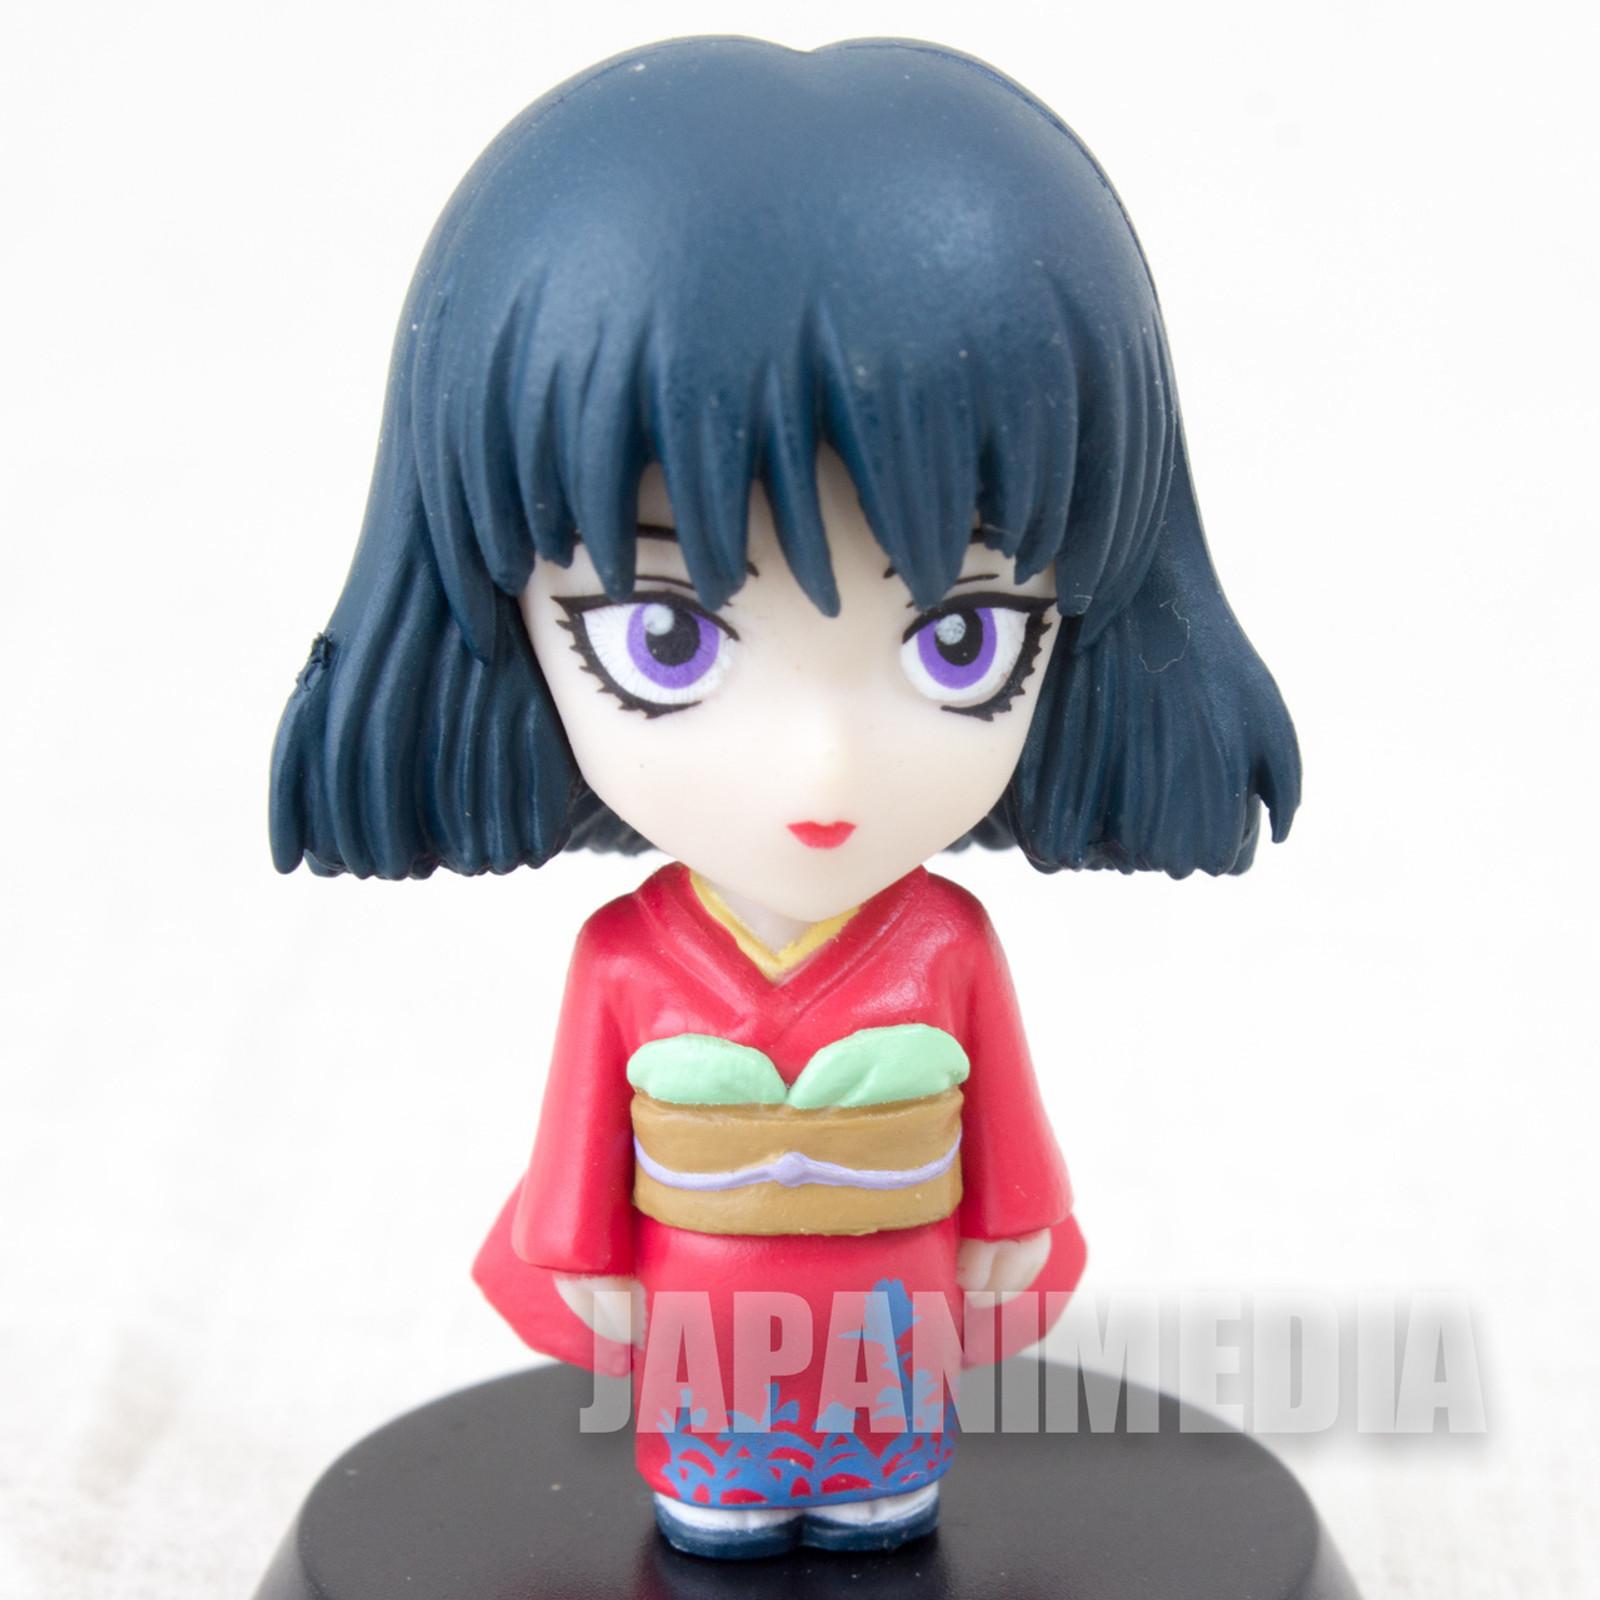 HUNTER x HUNTER Kalluto Zoldyck Anime Heroes Mini Big Head Figure JAPAN ANIME MANGA